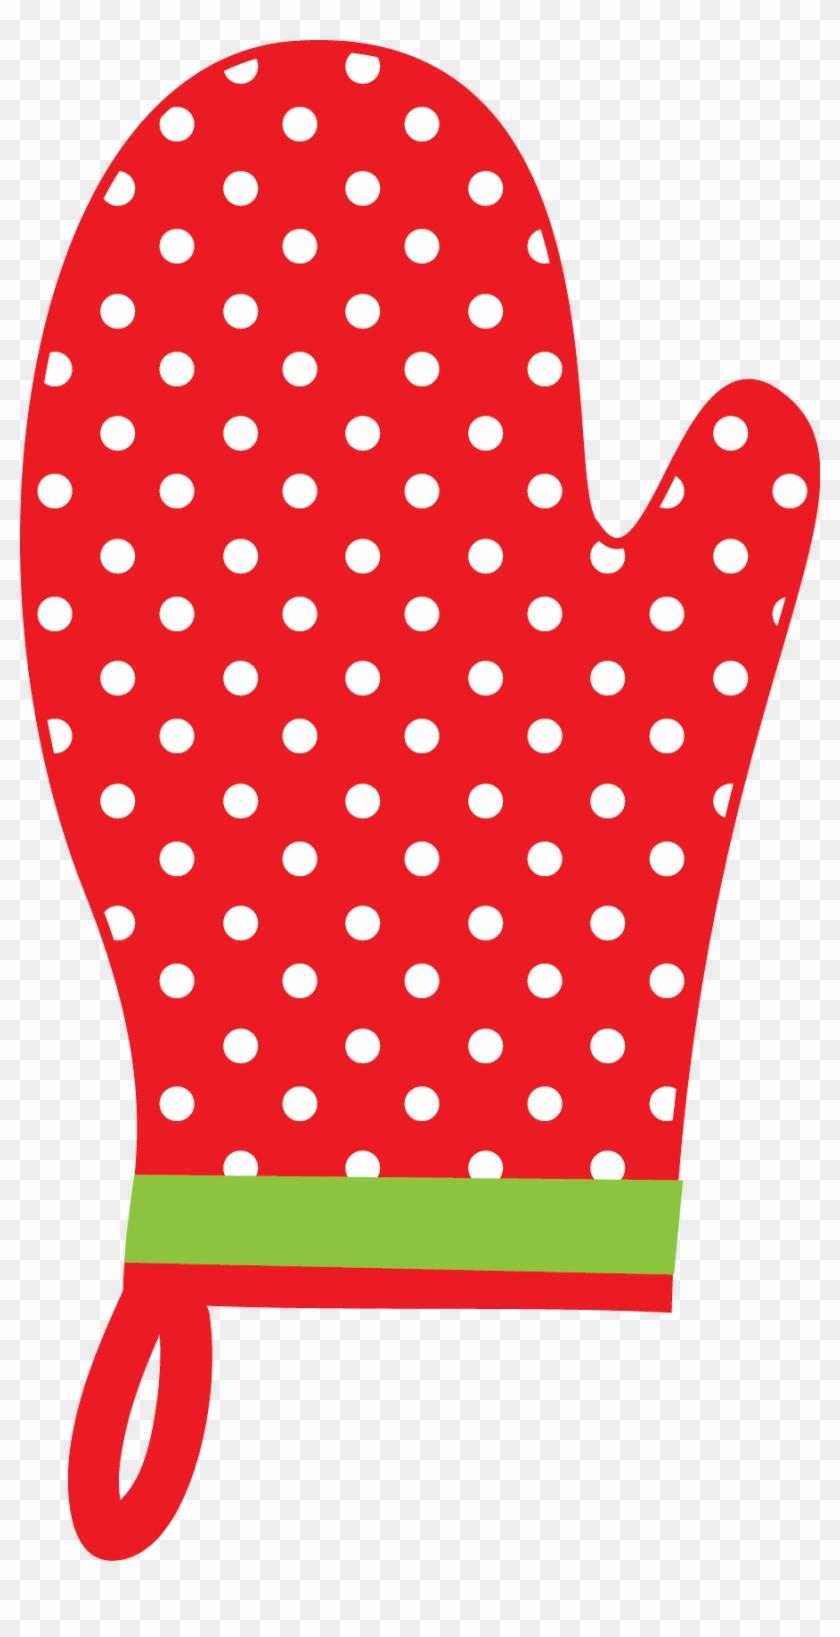 Christmas Oven Mitt Clip Art - Pot Holder Clip Art #8451